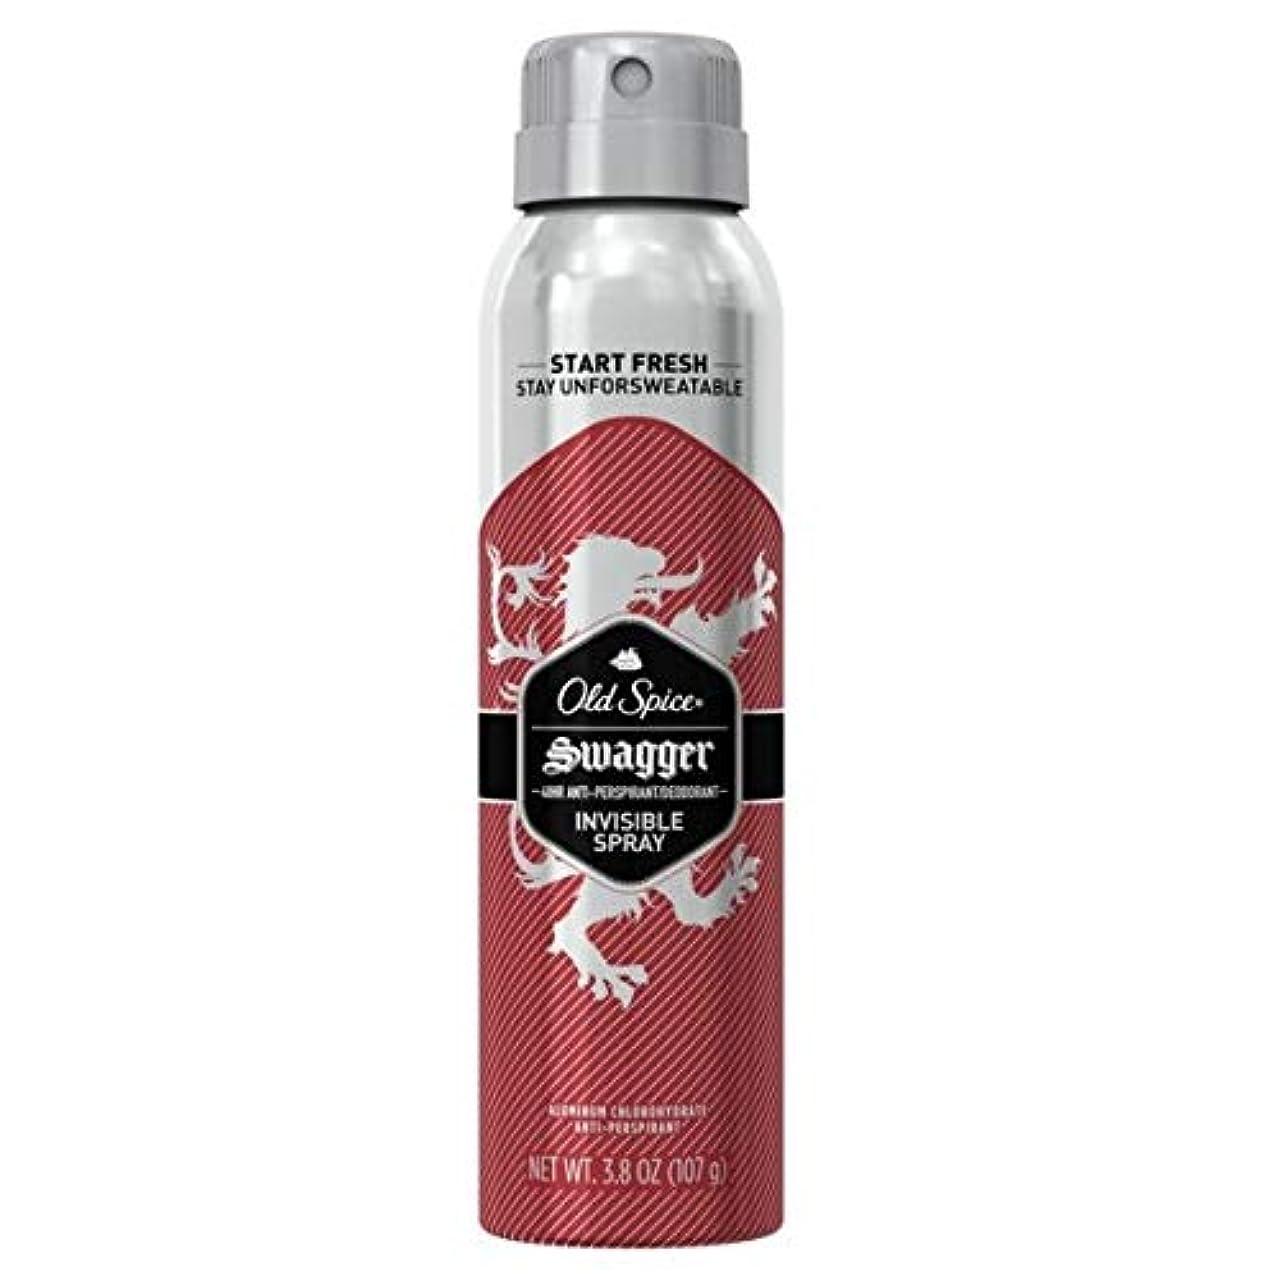 Old Spice Swagger Invisible Spray Antiperspirant and Deodorant - 3.8oz オールドスパイス インビジブルスプレー スワッガー 107g [並行輸入品]